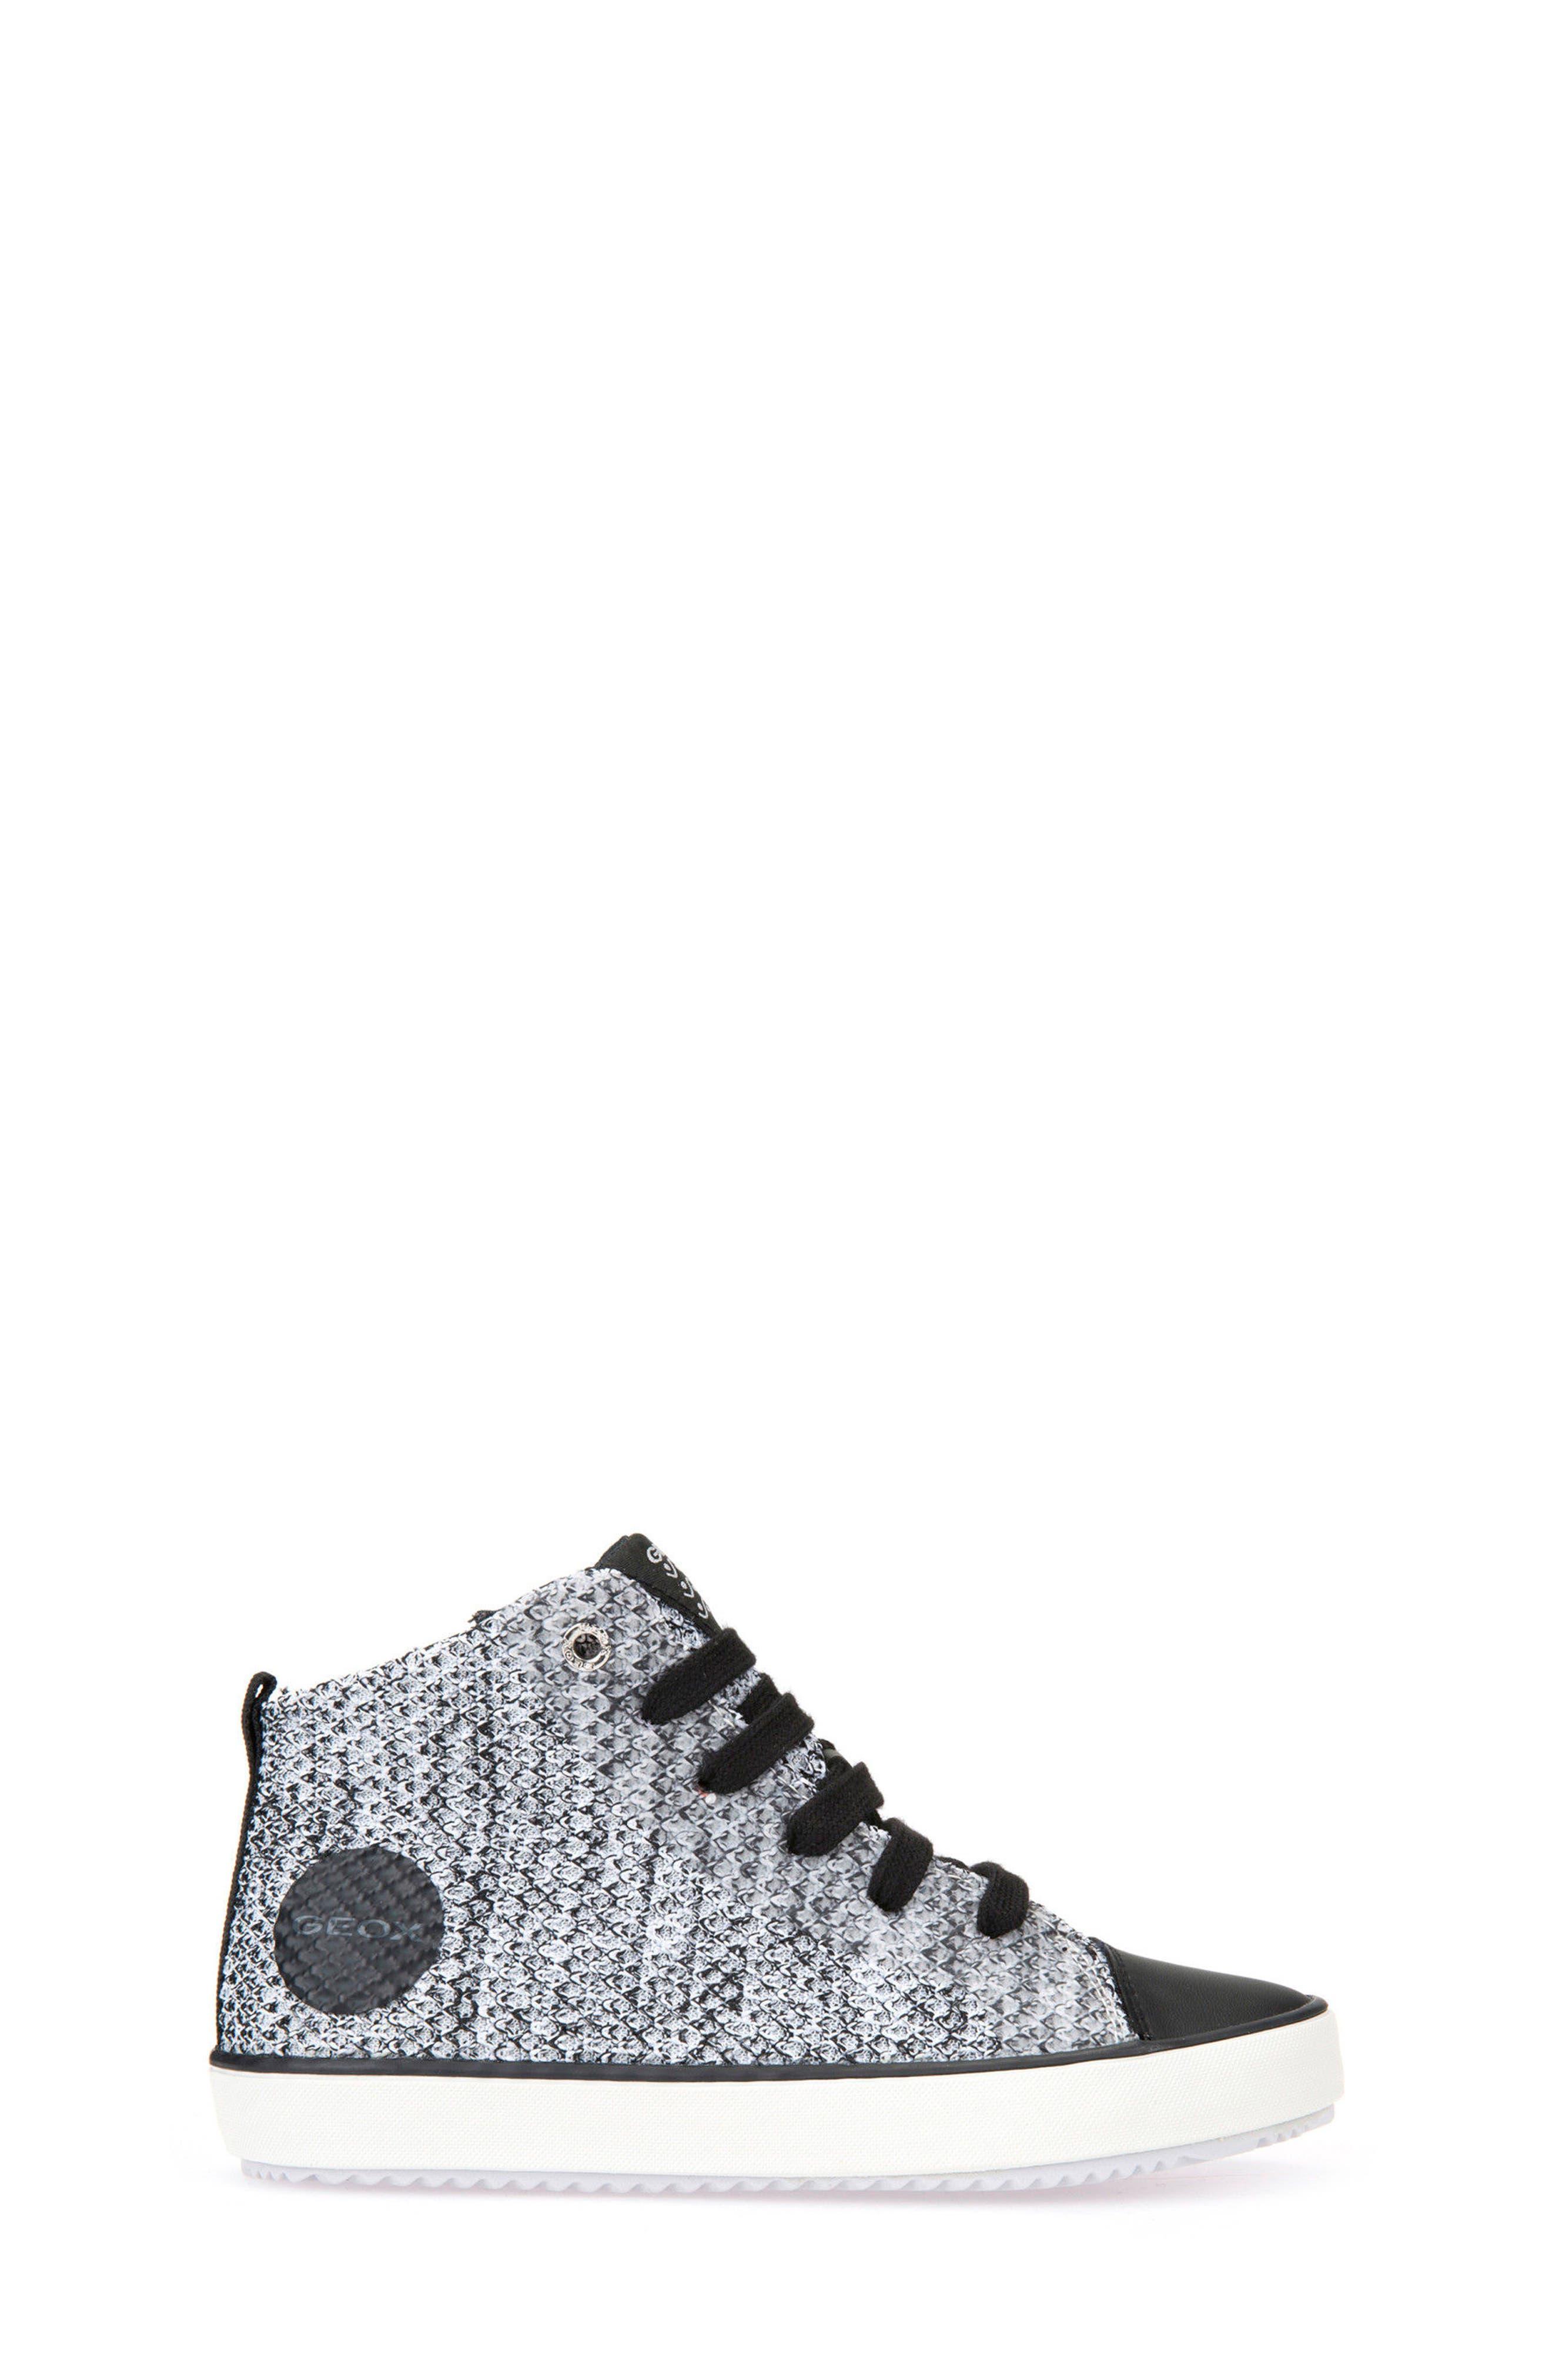 Alonisso Knit Mid Top Sneaker,                             Alternate thumbnail 3, color,                             WHITE/ BLACK